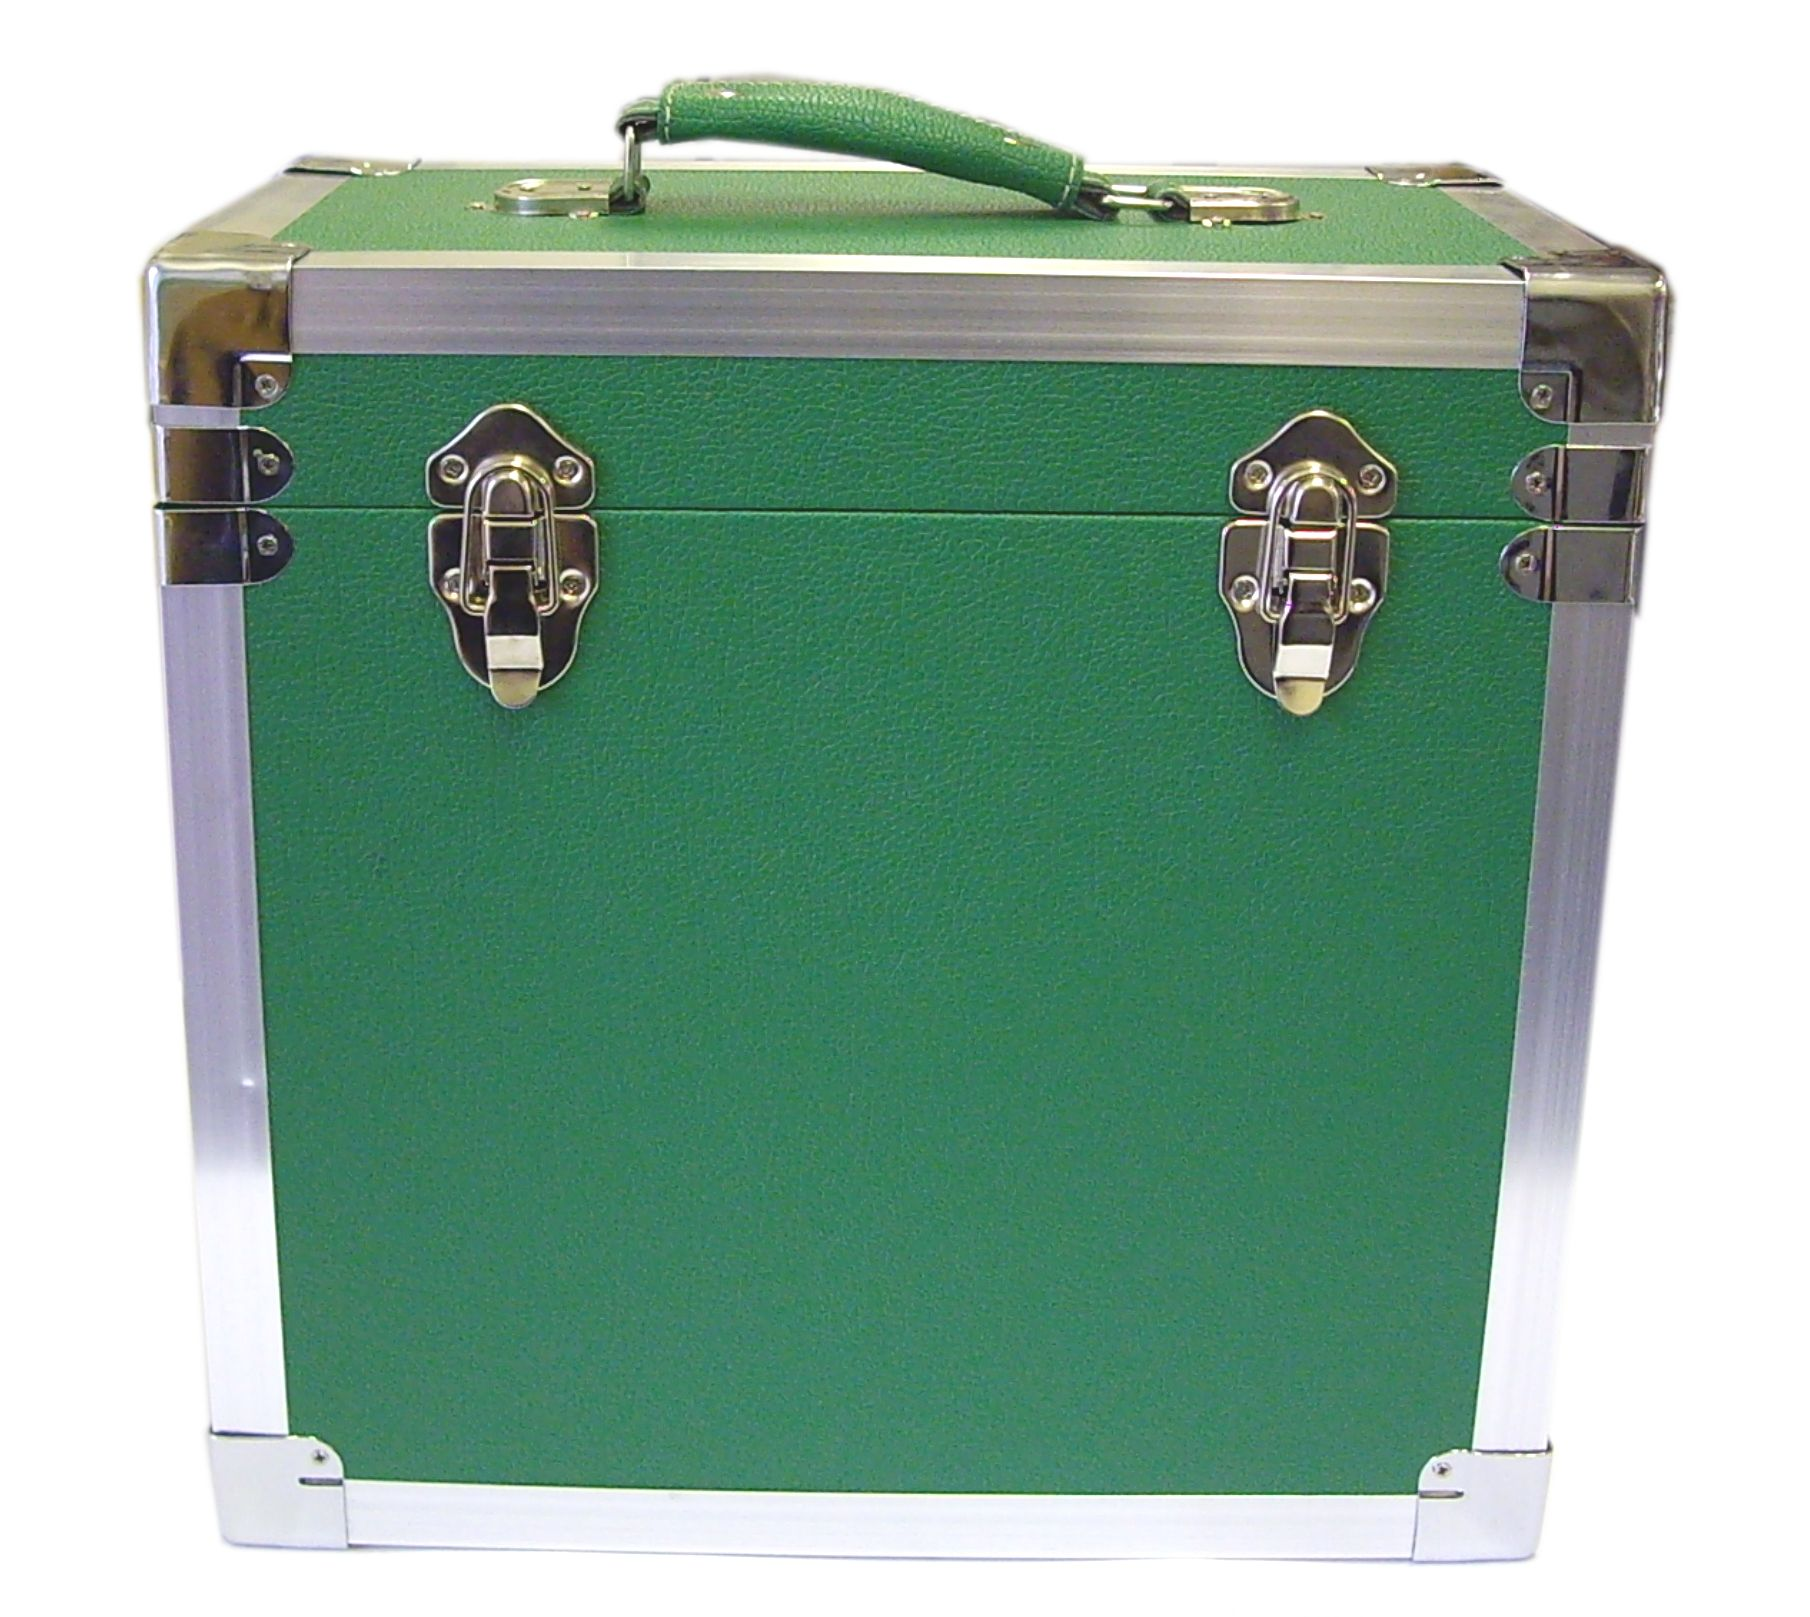 Steepletone SRB 2 12 Inch LP Vinyl Retro Style Record Storage Carry Case (Green)